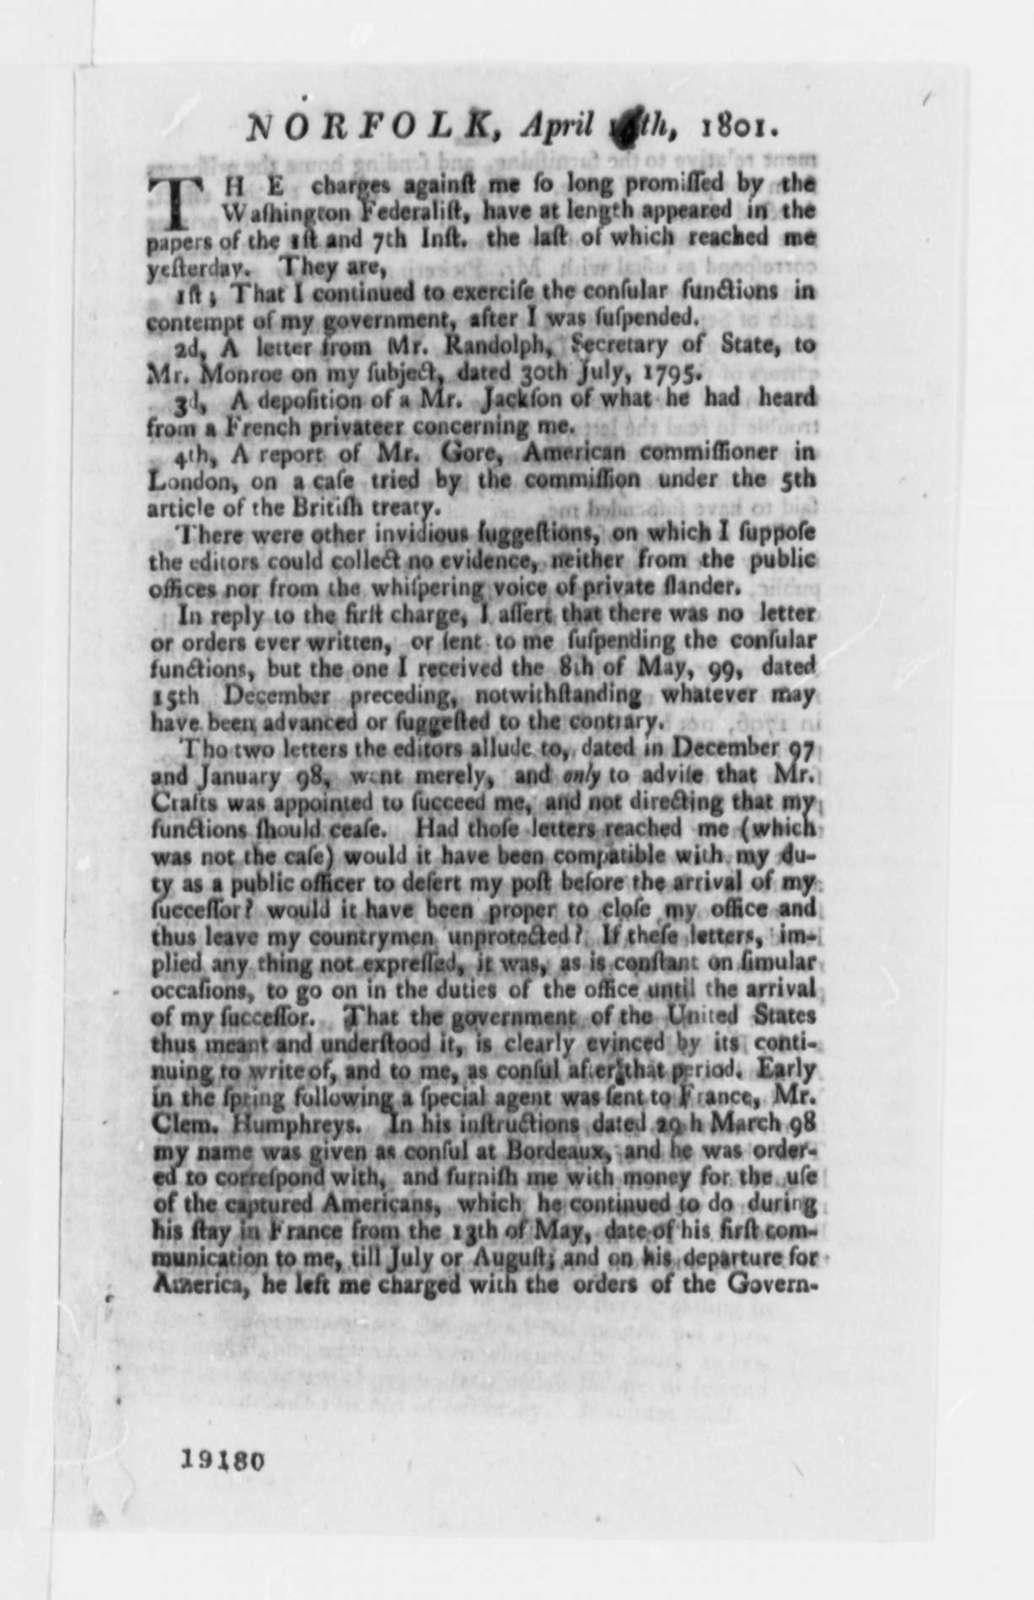 Joseph Fenwick to Thomas Jefferson, April 14, 1801, Printed